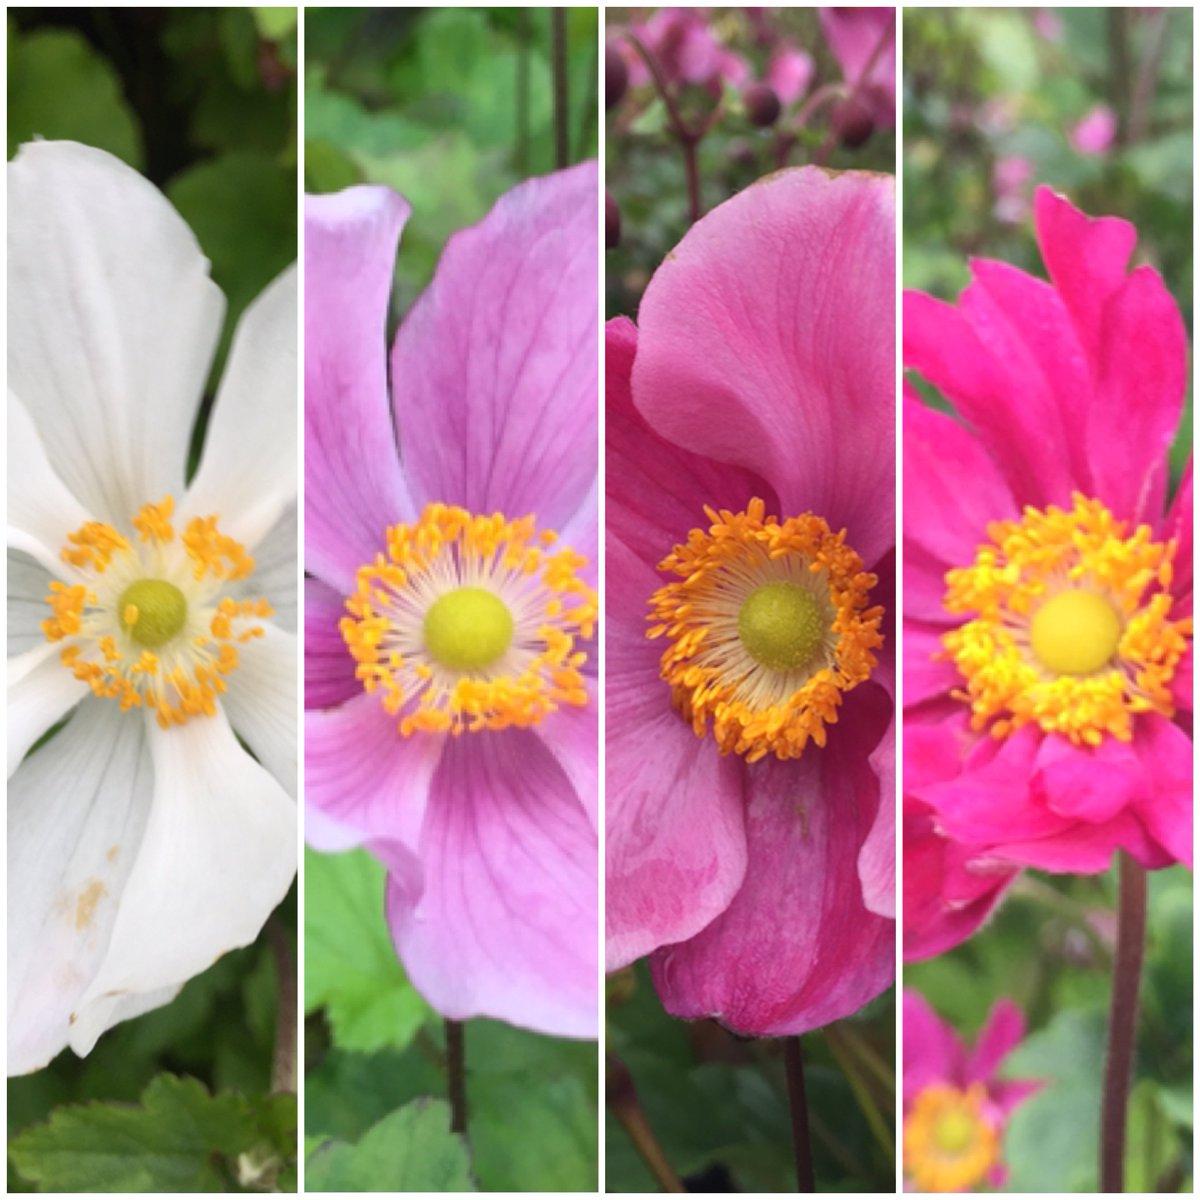 #Anemone line up. Honerine Jobert, Queen Charlotte, Praecox and Pamina. #summerflowers #gardenideas #AVlist<br>http://pic.twitter.com/0BwGHWPBaR